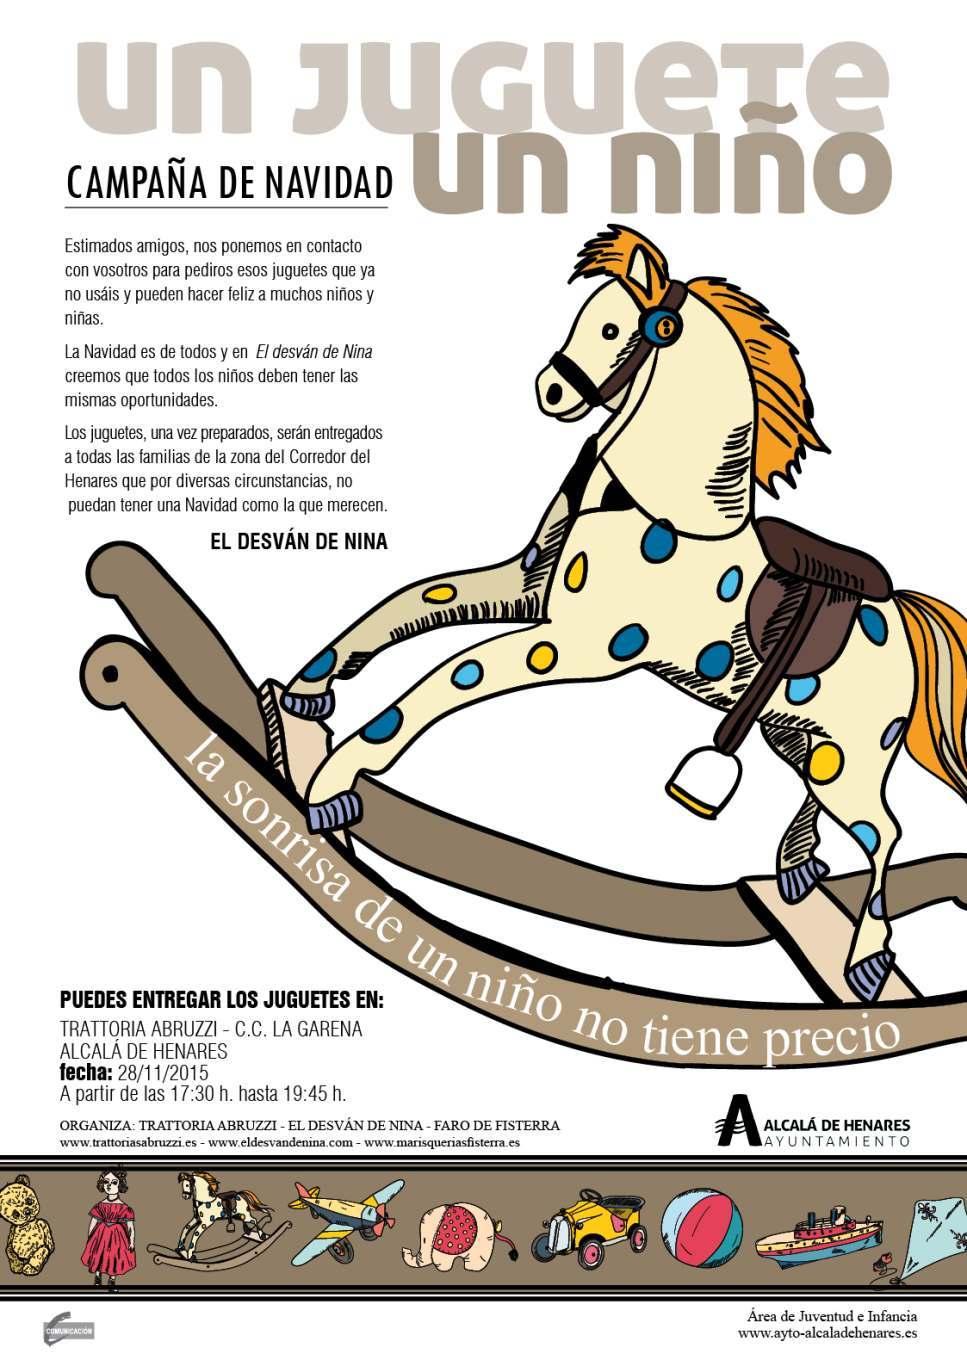 Un Dream Alcalá Campaña Solidaria JugueteNiño A543RLqcjS